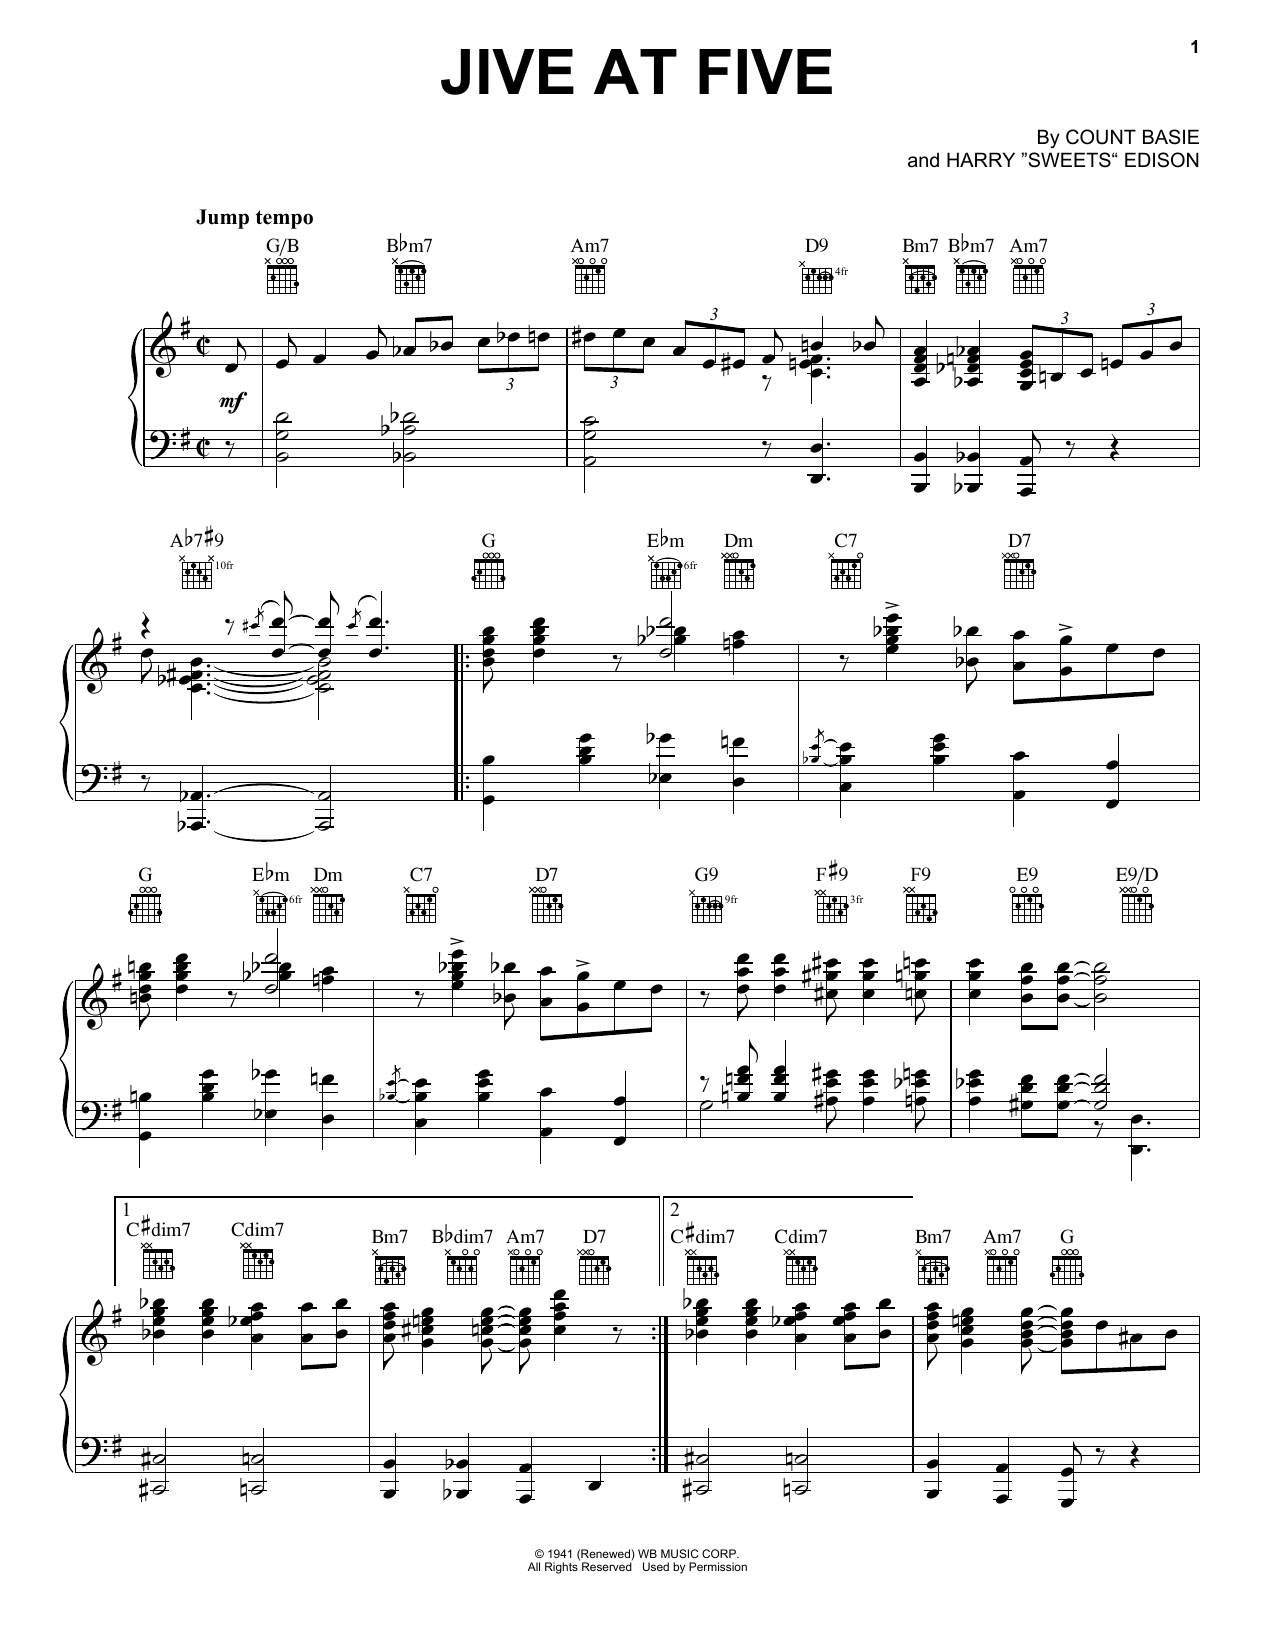 Count Basie Jive At Five sheet music notes and chords. Download Printable PDF.